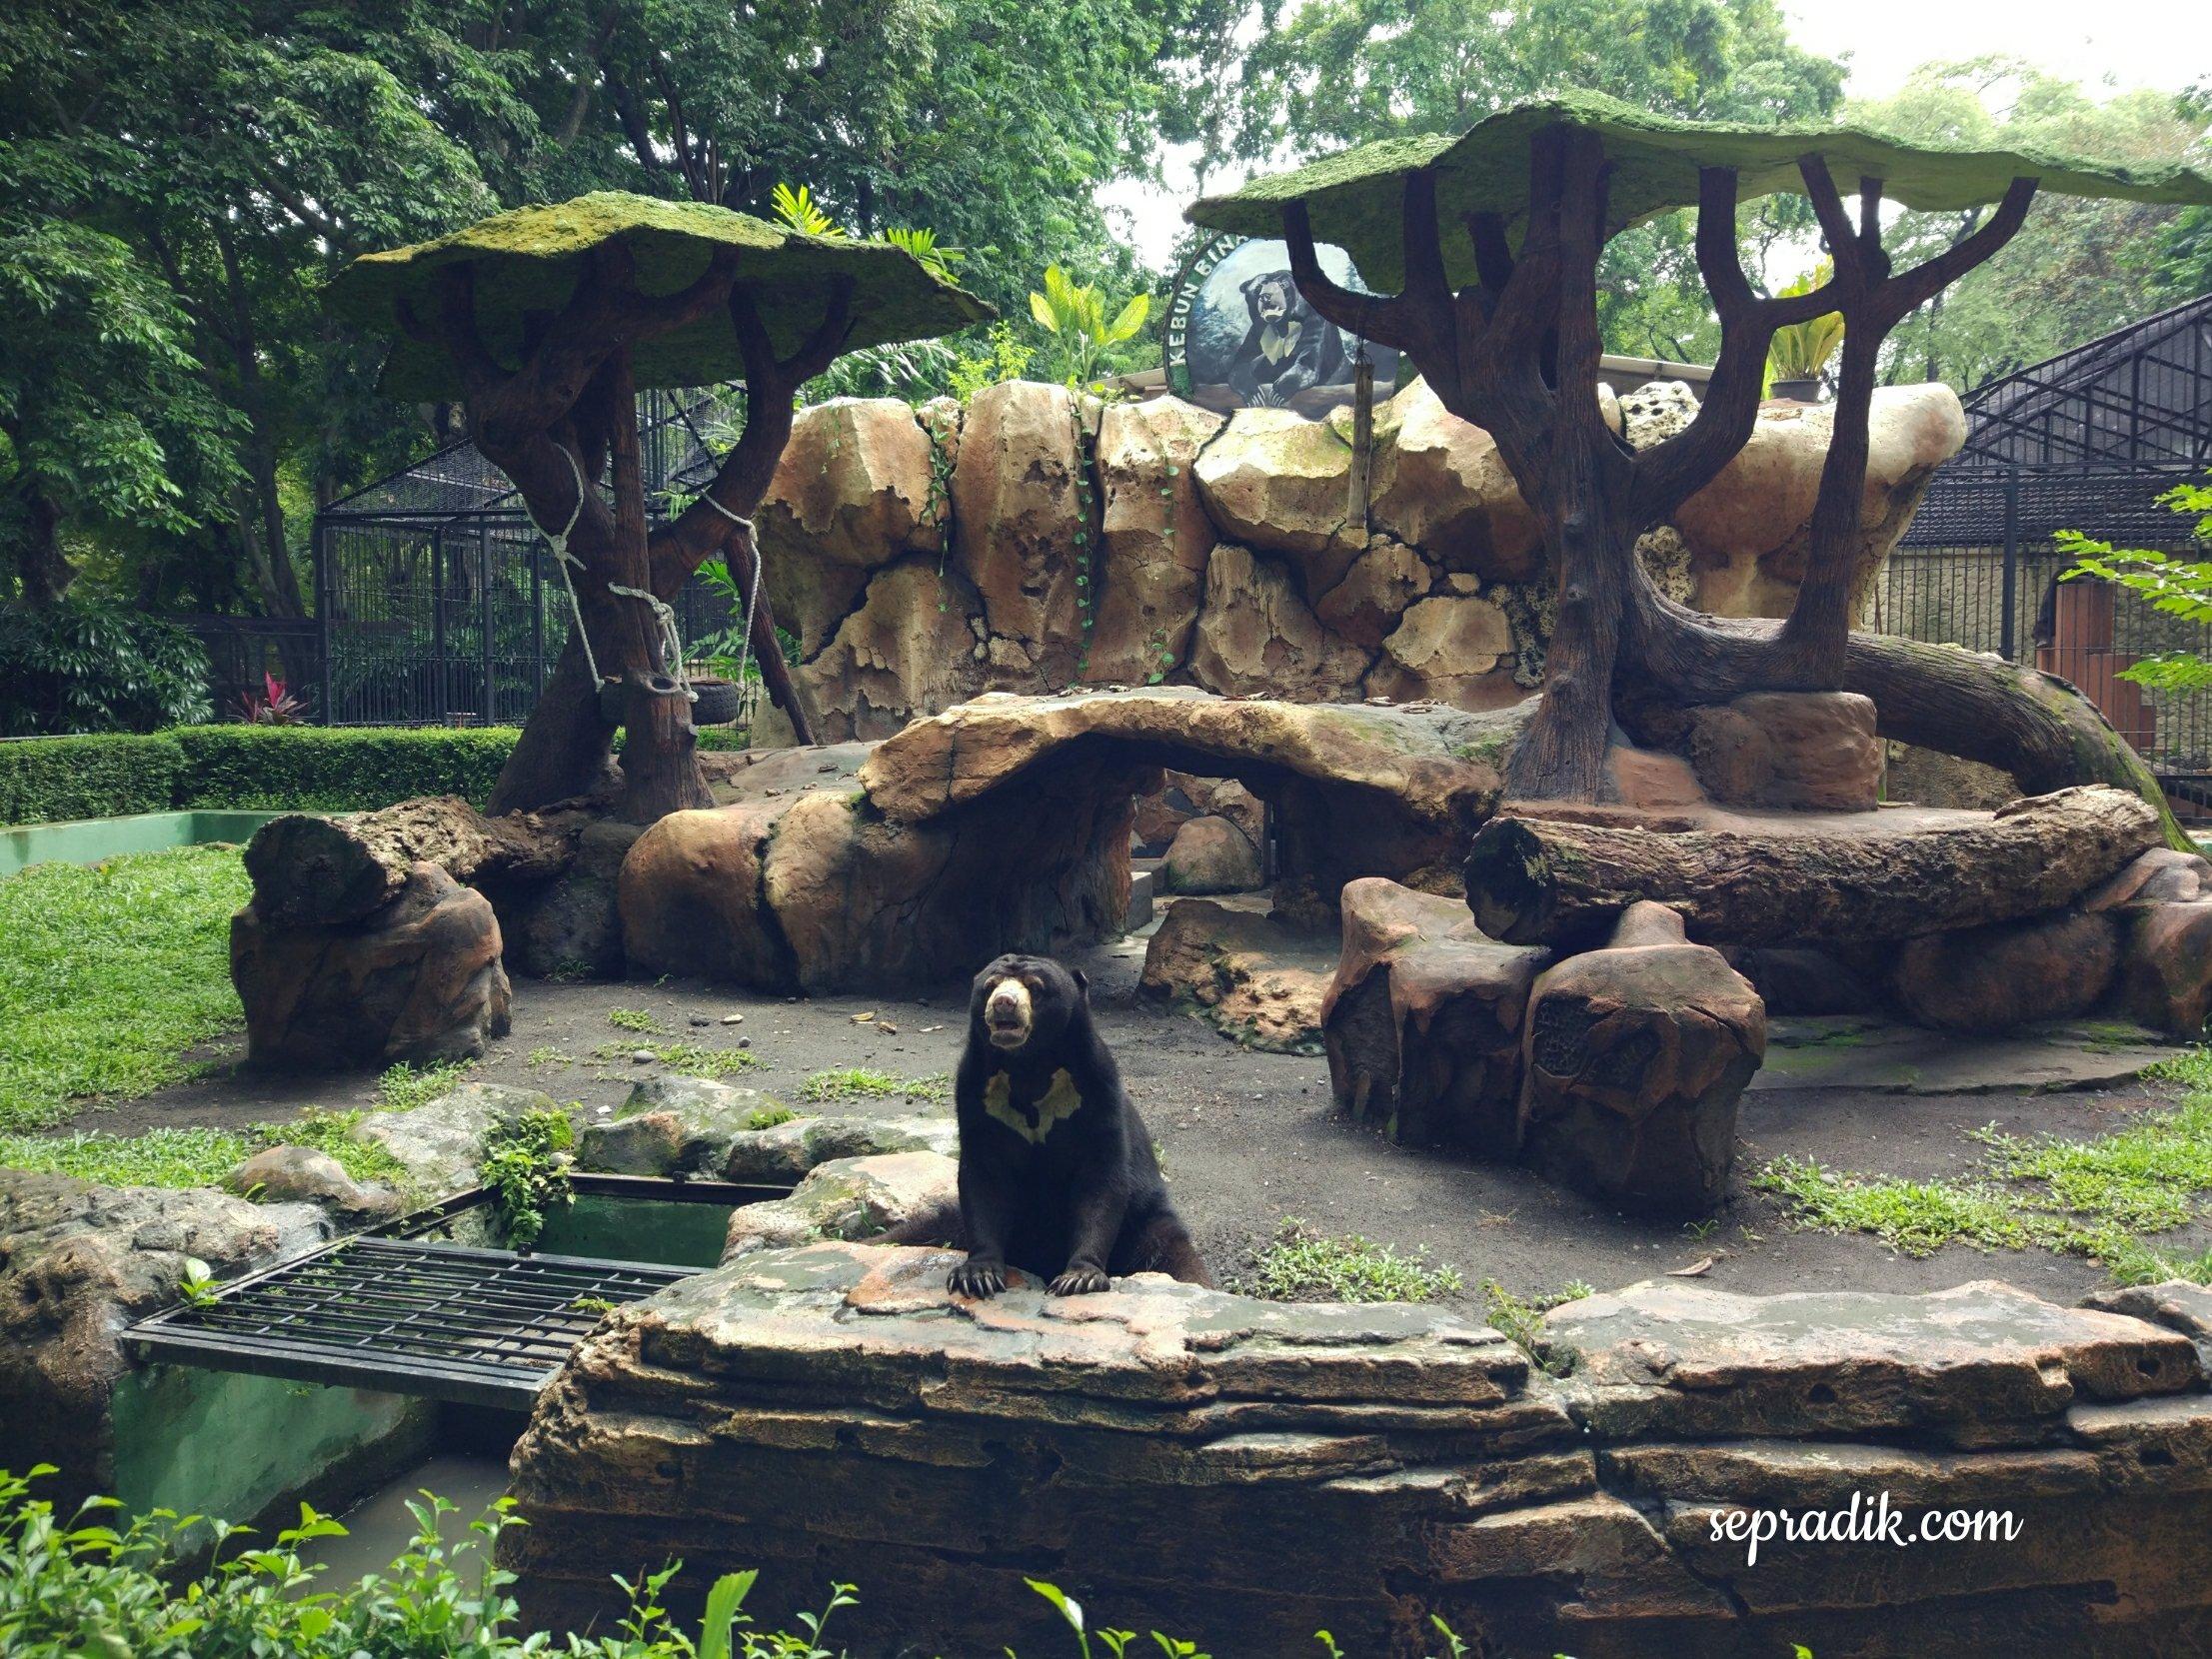 Kebun Binatang Surabaya 2017